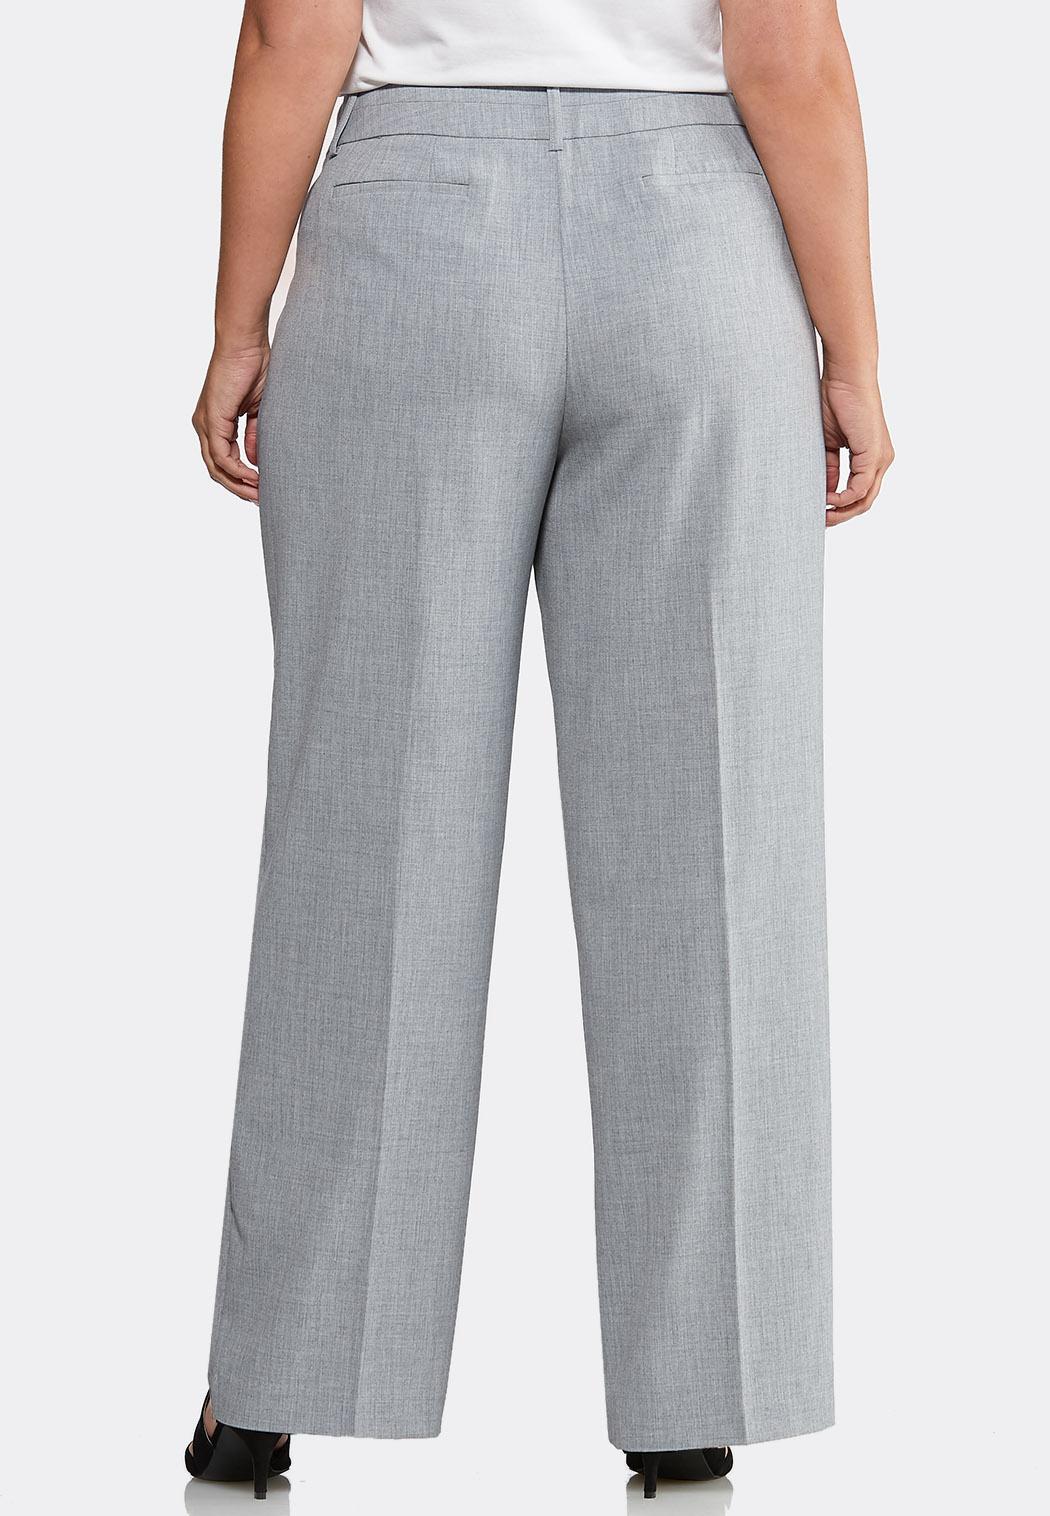 Plus Petite Curvy Shape Enhancing Trouser Pants (Item #43995236)